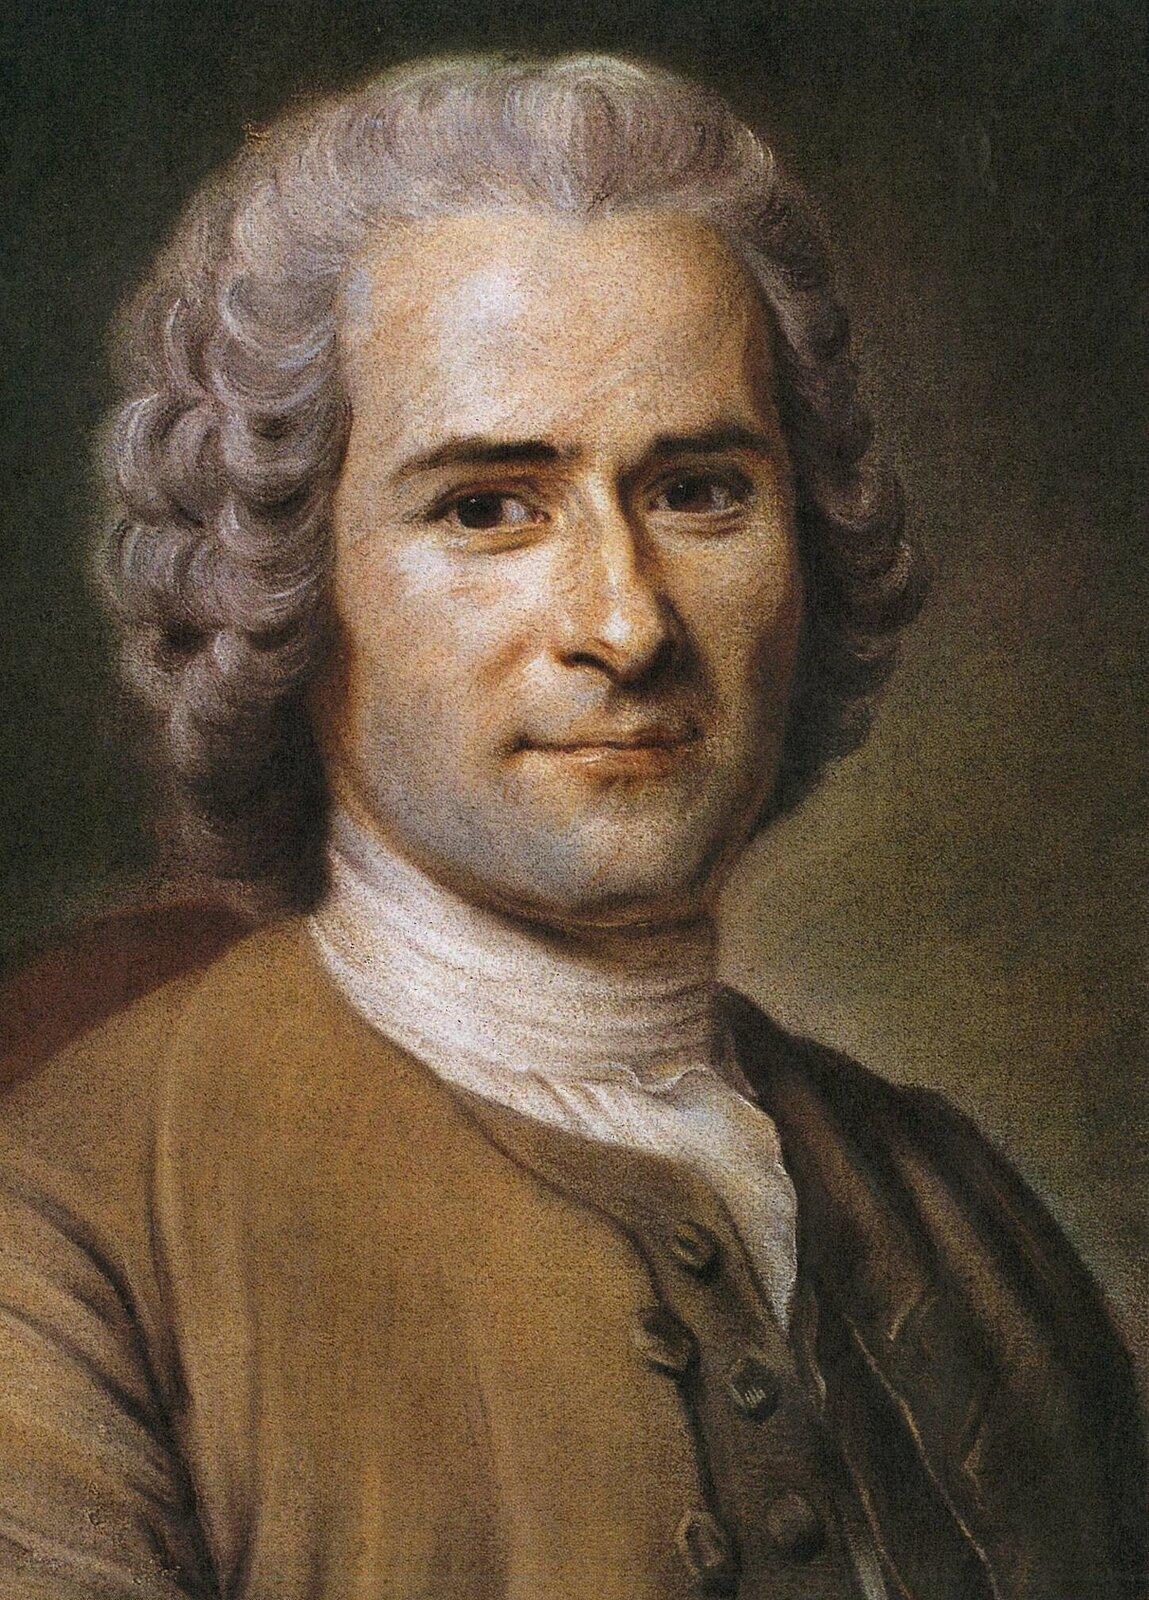 Portret Jeana Jacquesa Rousseau Źródło: Maurice Quentin de La Tour, Portret Jeana Jacquesa Rousseau, brak daty powstania, pastele na papierze, Musée Antoine-Lécuyer, Francja , domena publiczna.